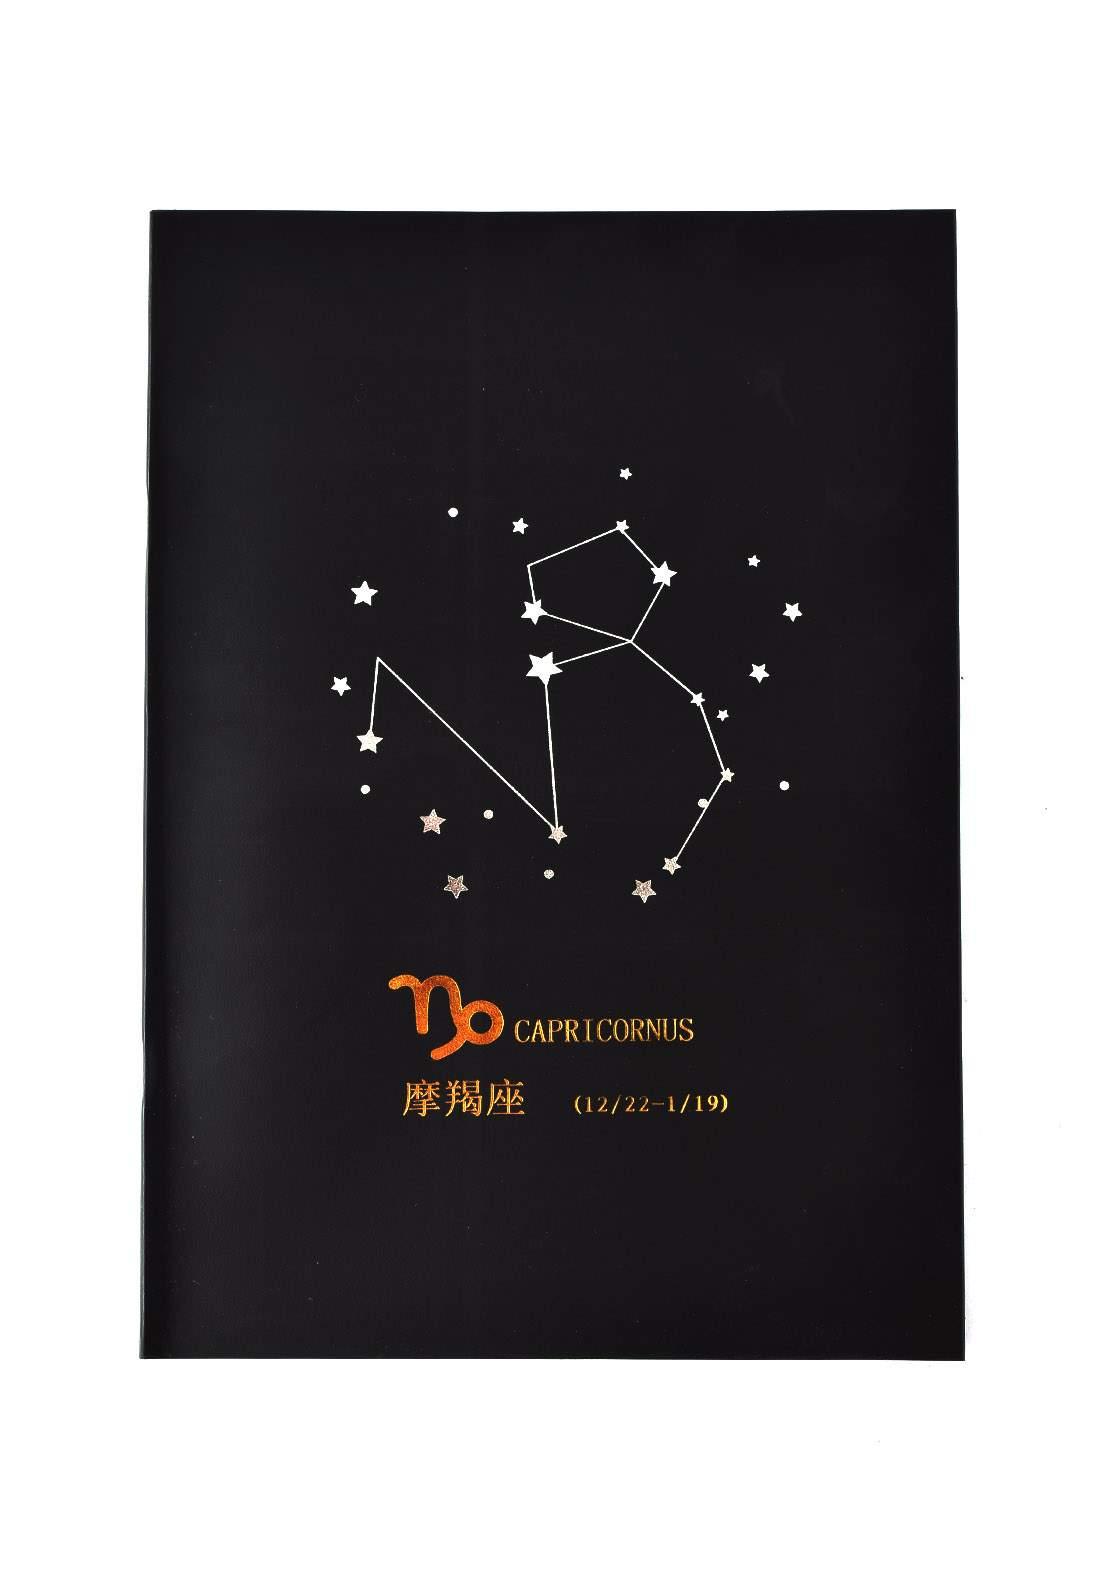 Big Black Drawing Book 24 Sheets-Capricornus دفتر رسم اسود كبير بطبعة برج الجدي